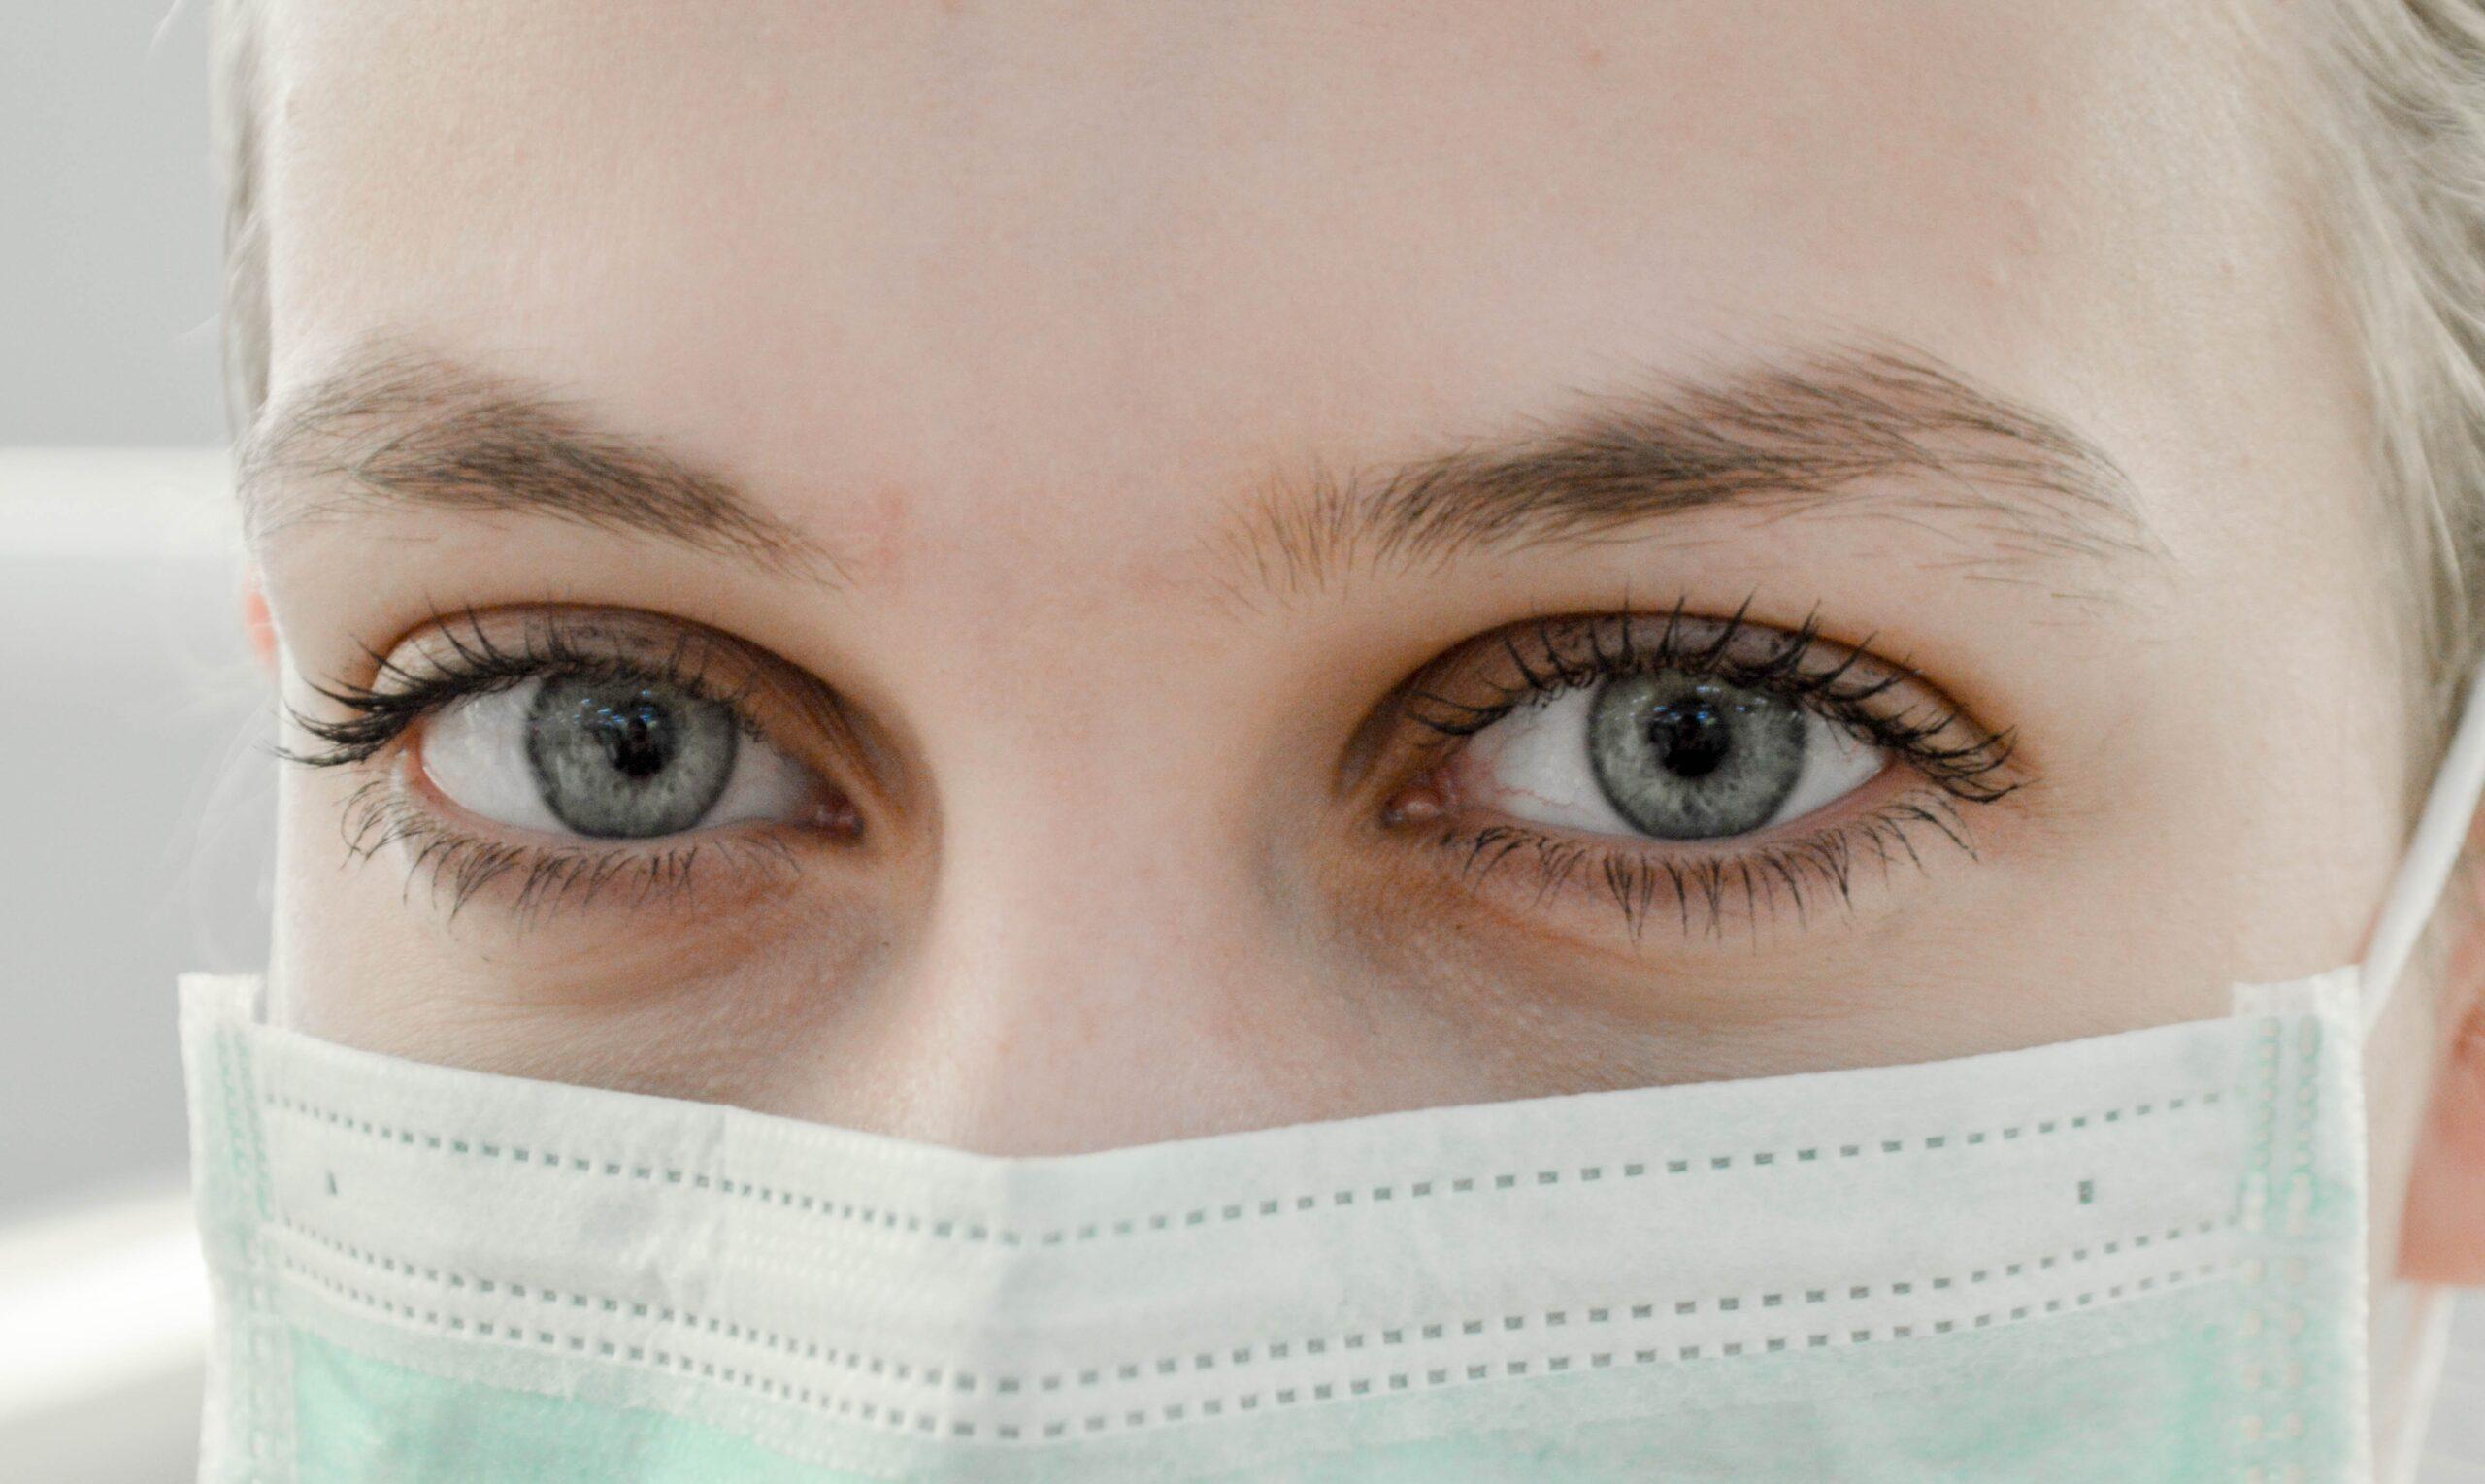 coronavirus, coronavirus washington state, us coronavirus, snohomish county coronavirus, seatac coronavirus, medical mask,